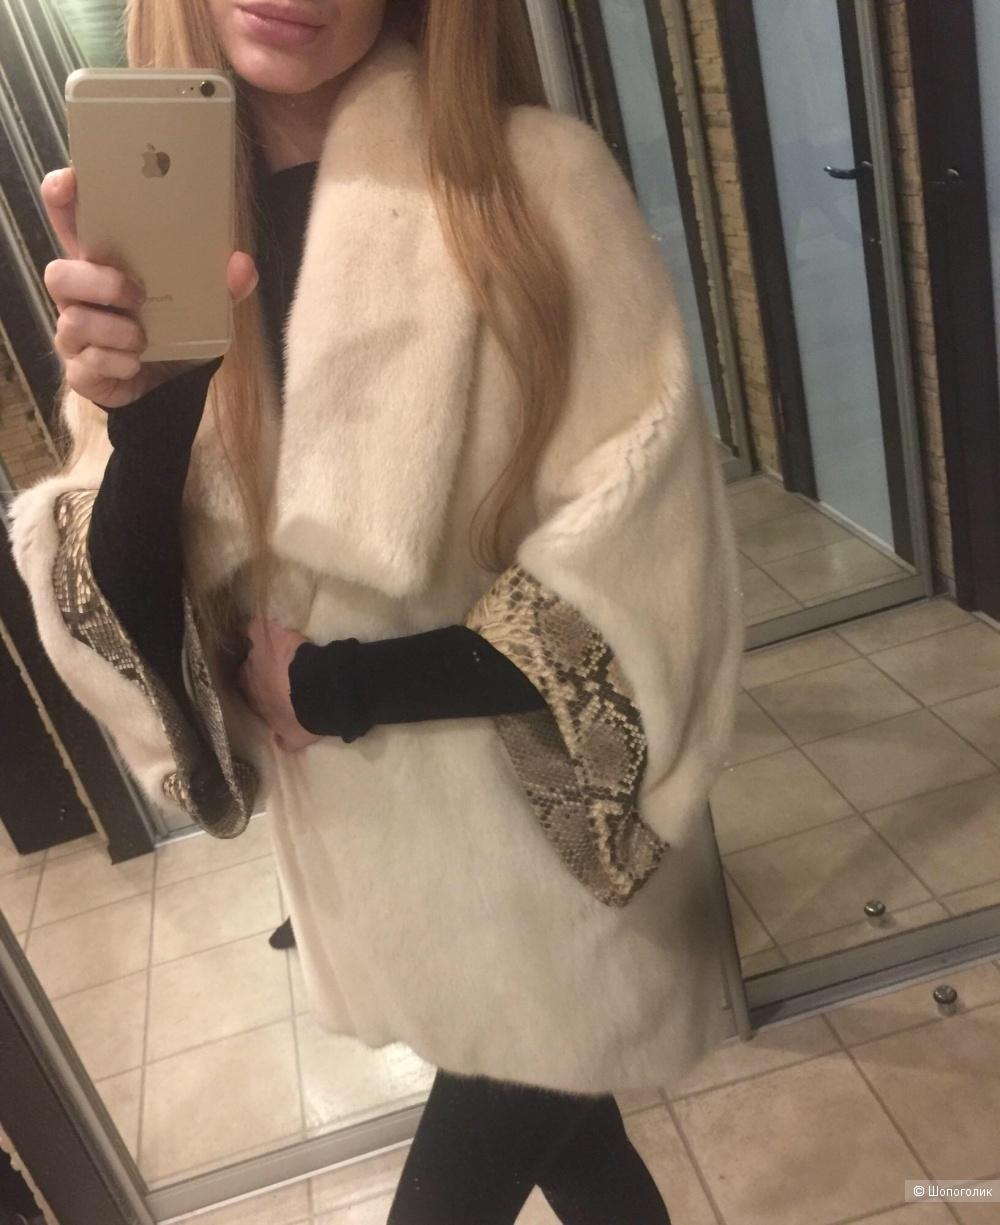 Норковая шуба с питоном Saga Furs (Nina Ricci)40-42-44